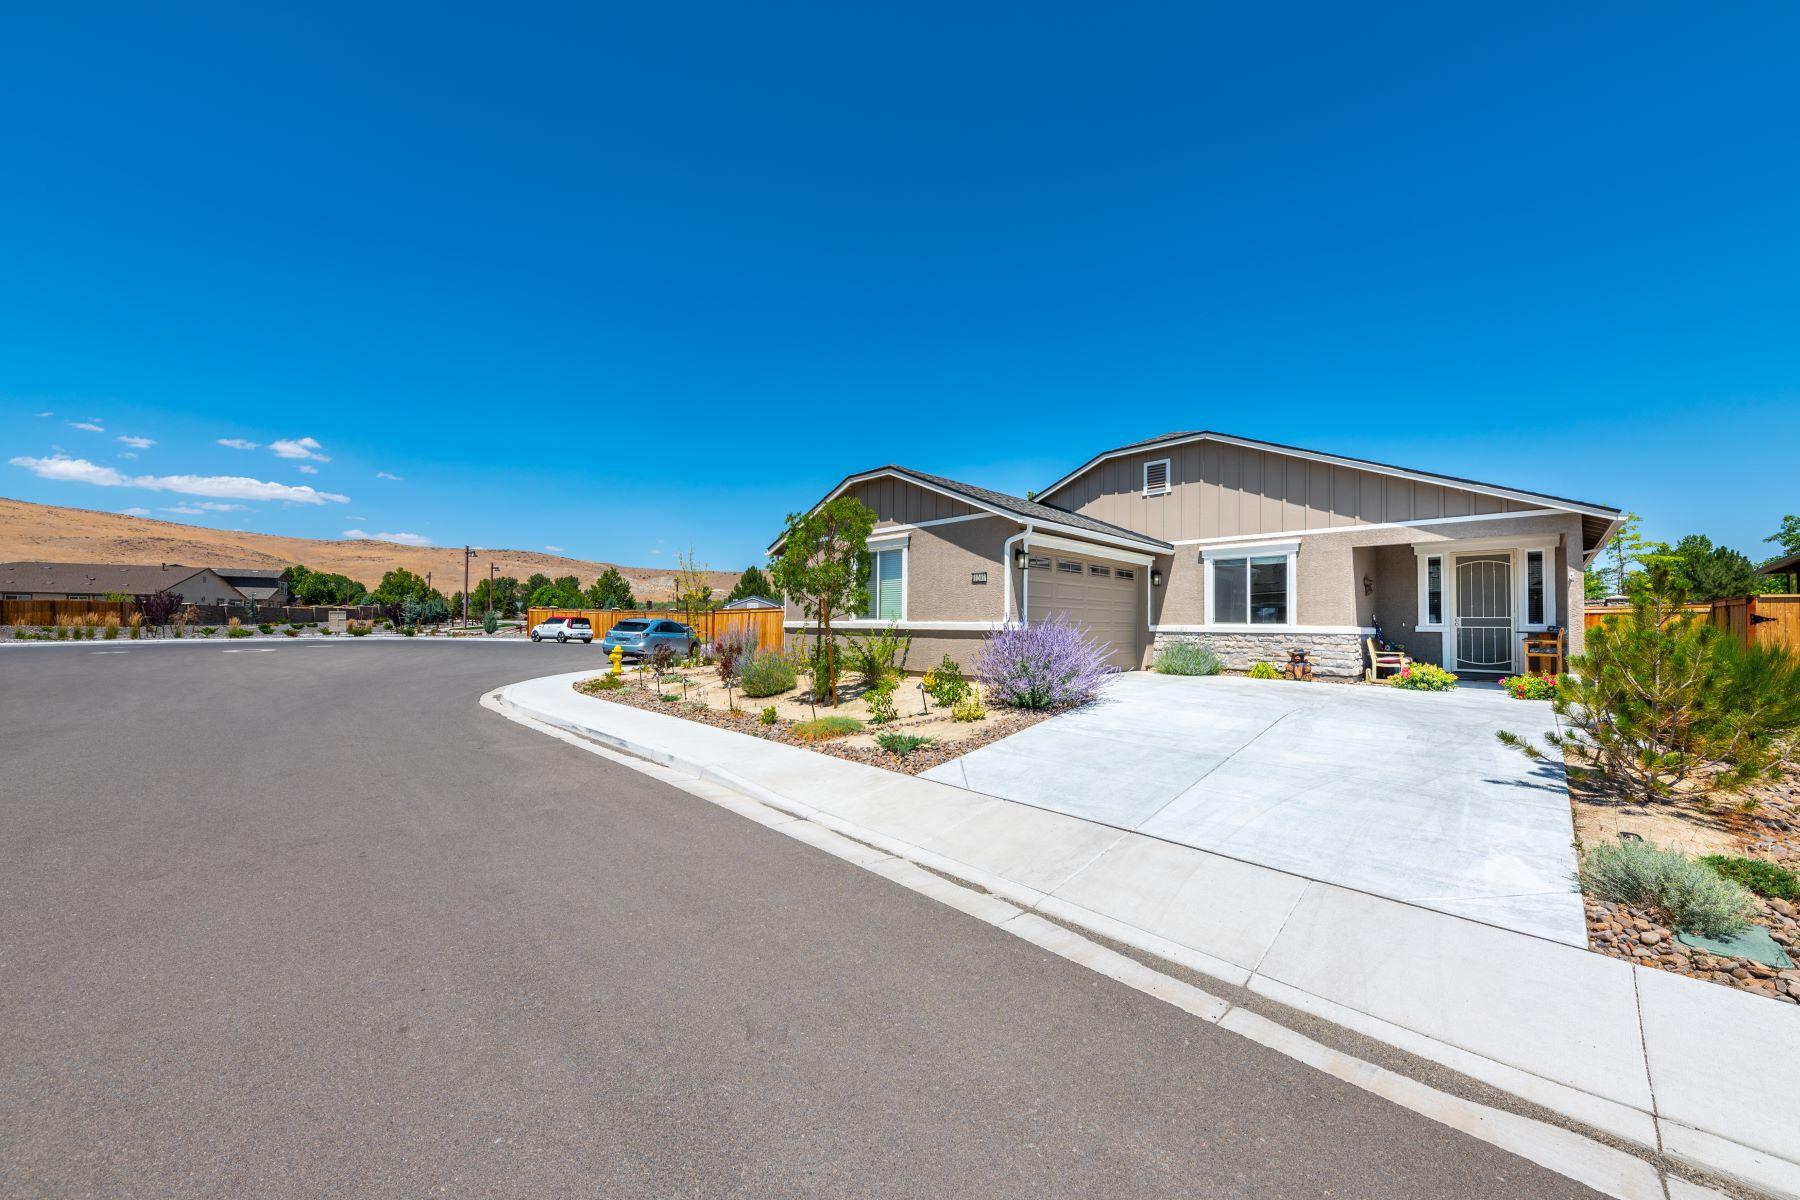 Single Family Homes для того Продажа на Four Bedroom Kiley Ranch Home 1207 Silver Coyote Drive, Sparks, Невада 89436 Соединенные Штаты